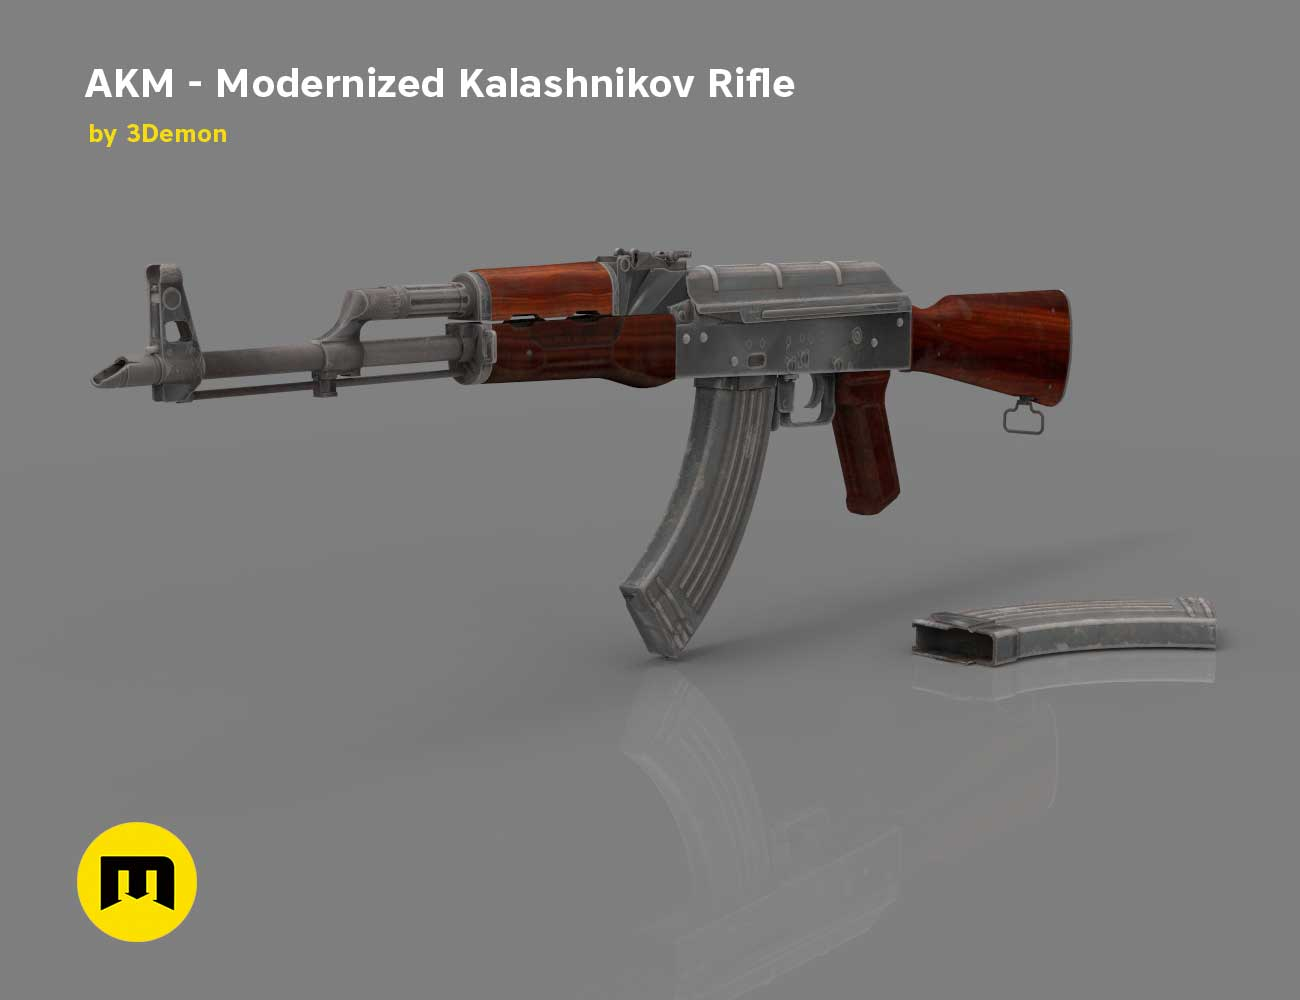 AKM - Modernized Kalashnikov Automatic Rifle Low-poly